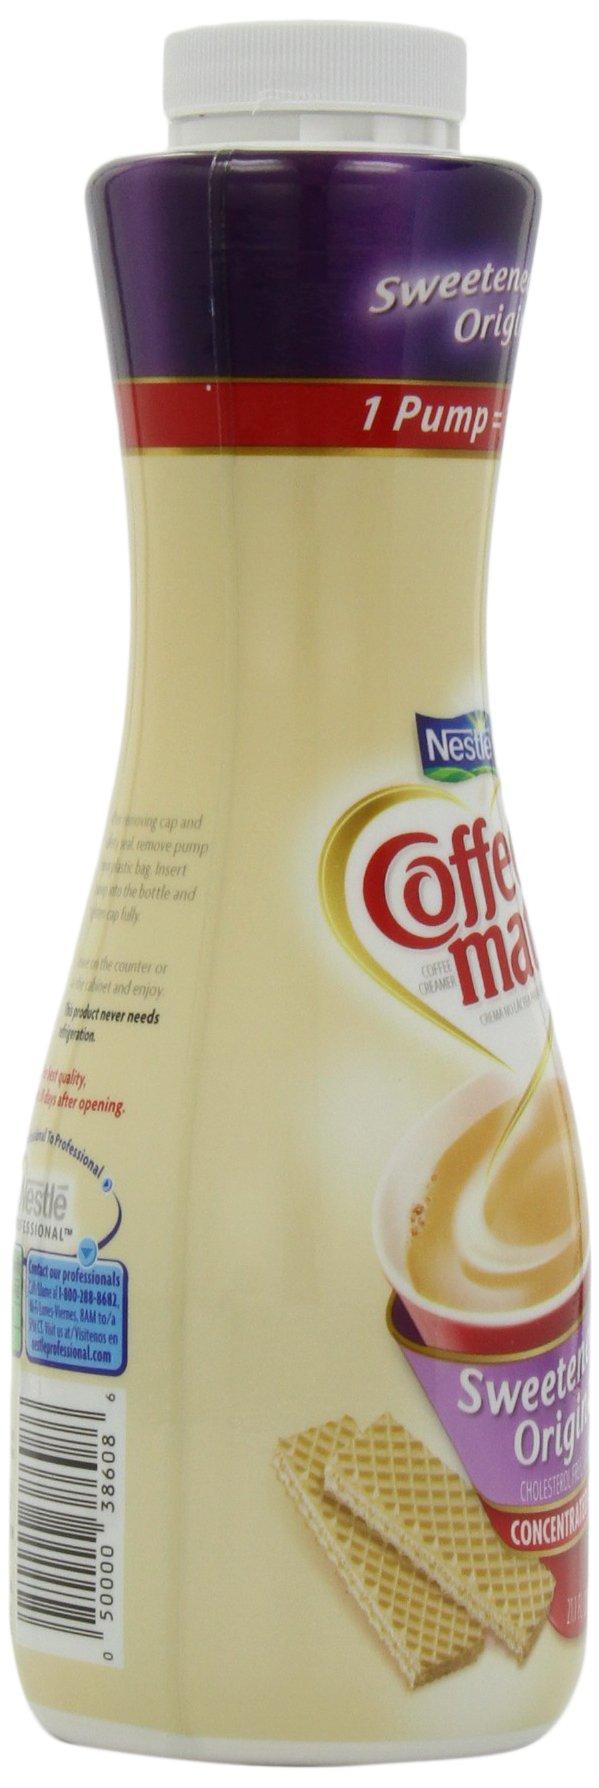 Nestle Coffee-mate Coffee Creamer, Sweetened Original, 21.1 oz liquid pump bottle by Nestle Coffee Mate (Image #8)